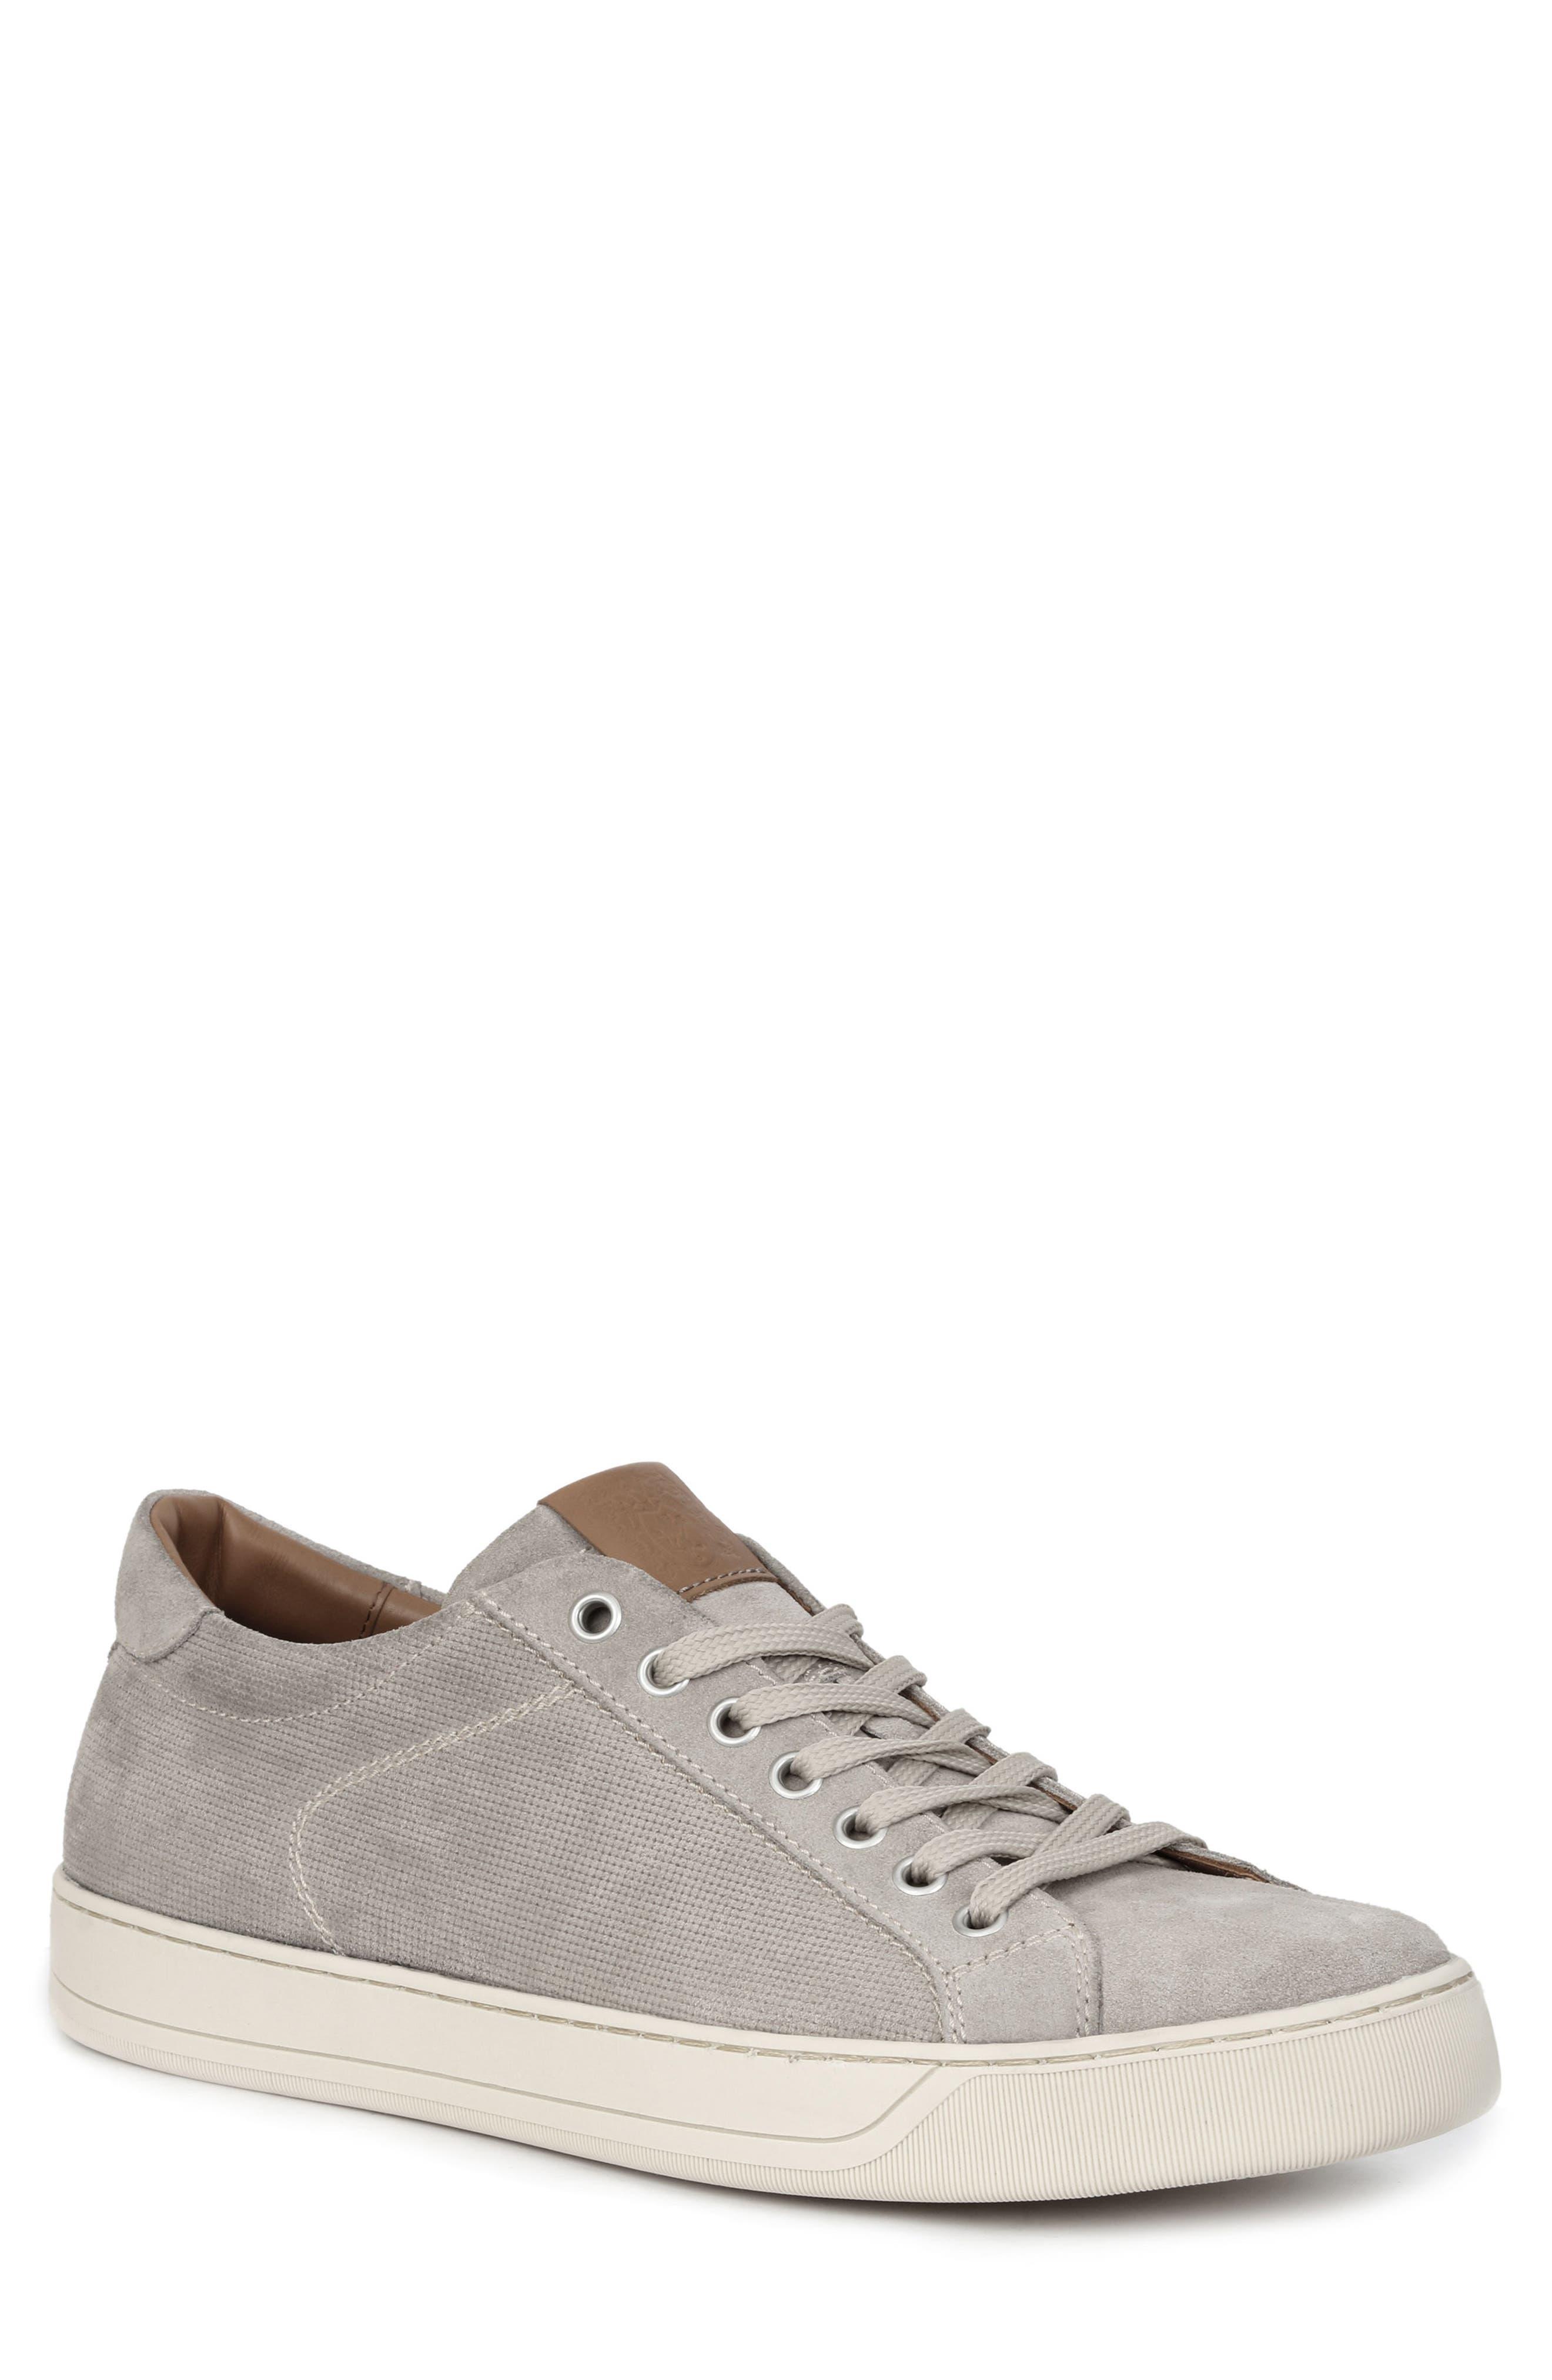 Walter Sneaker,                             Main thumbnail 1, color,                             Grey